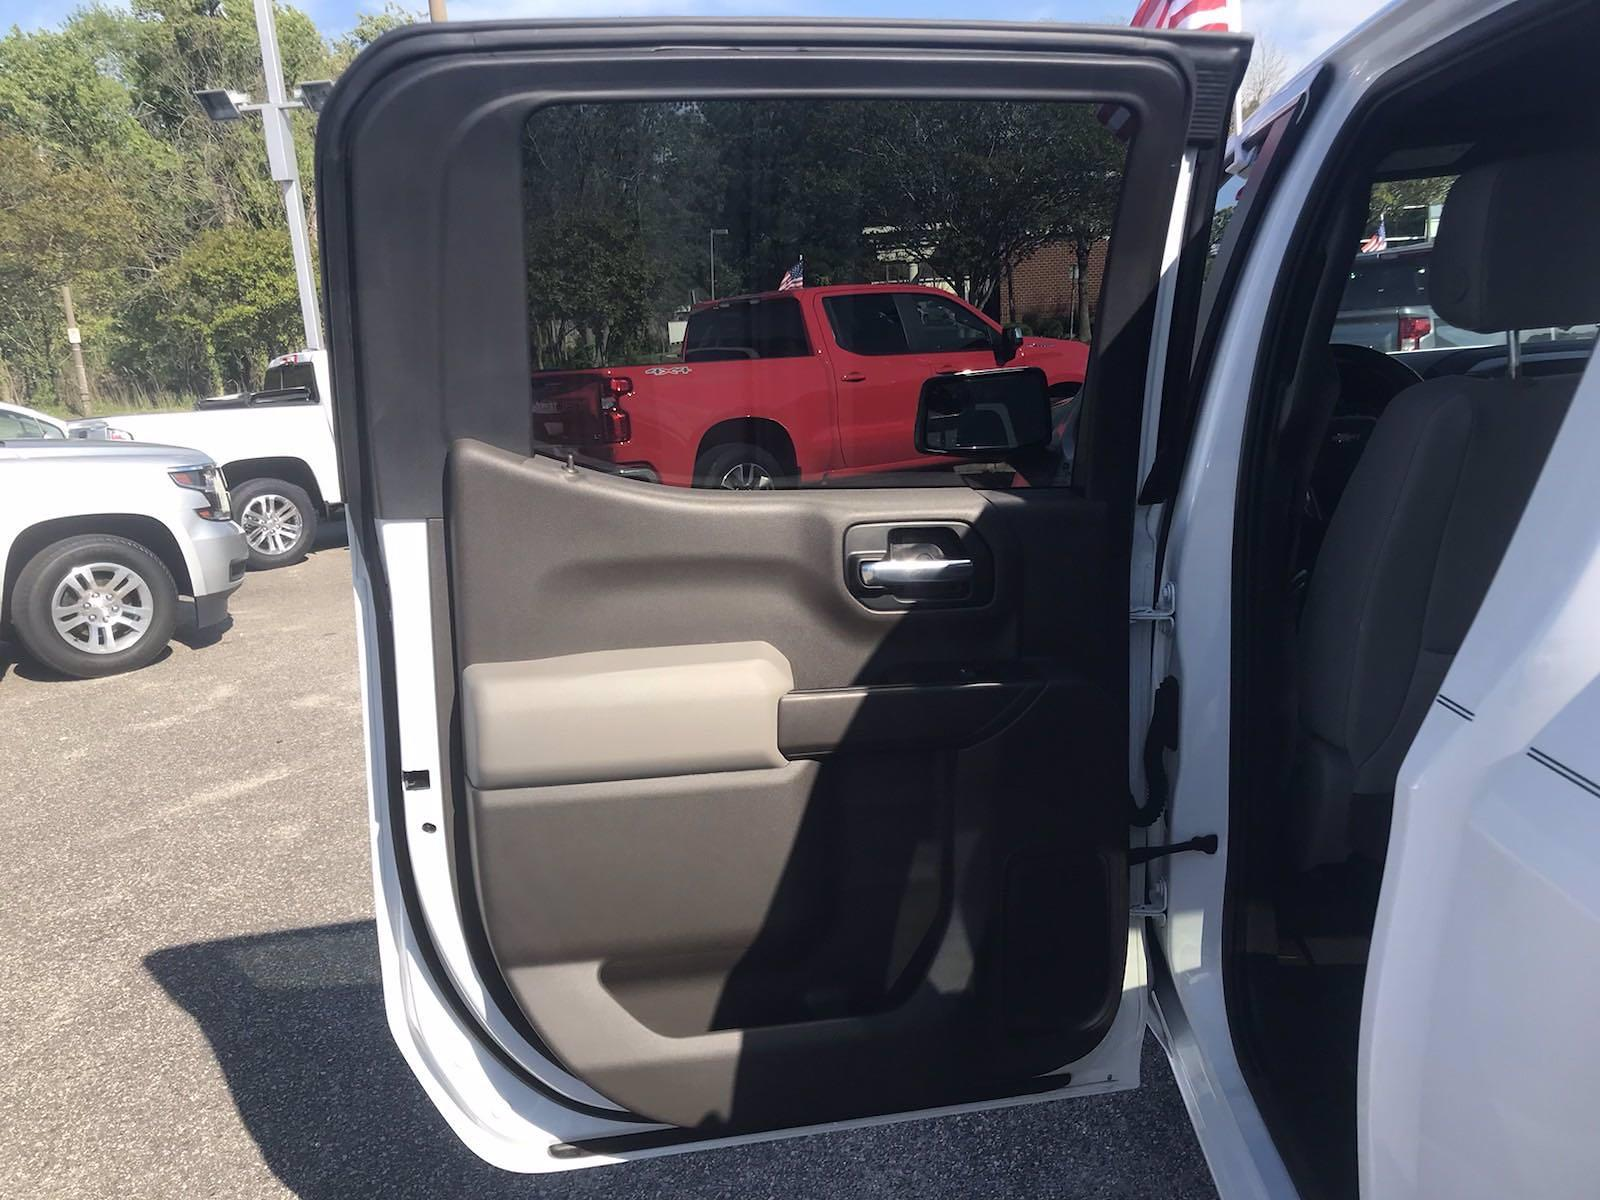 2019 Chevrolet Silverado 1500 Crew Cab 4x4, Pickup #16513P - photo 44